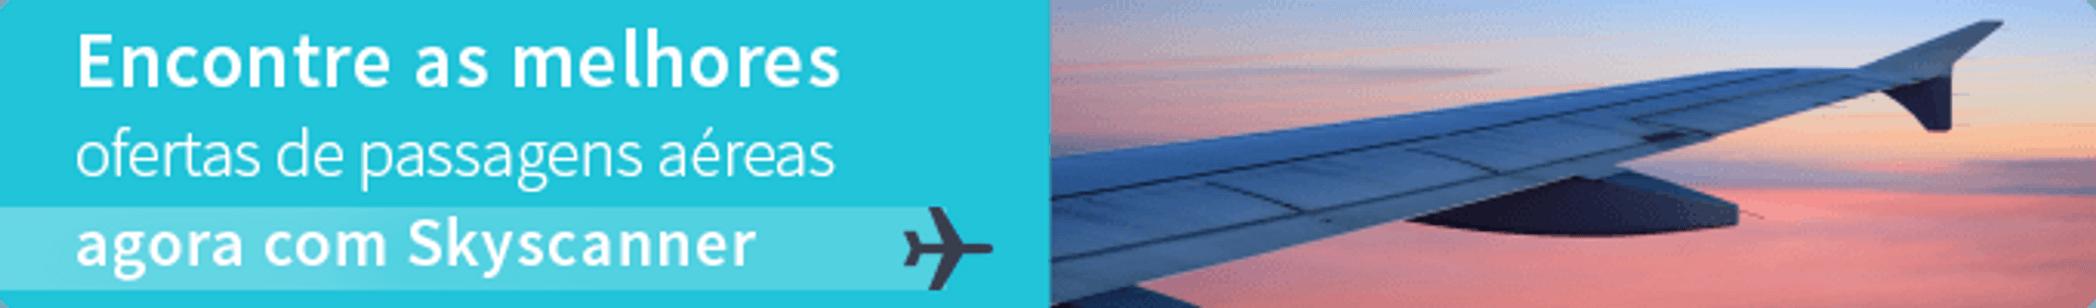 Passagens aéreas Skyscanner